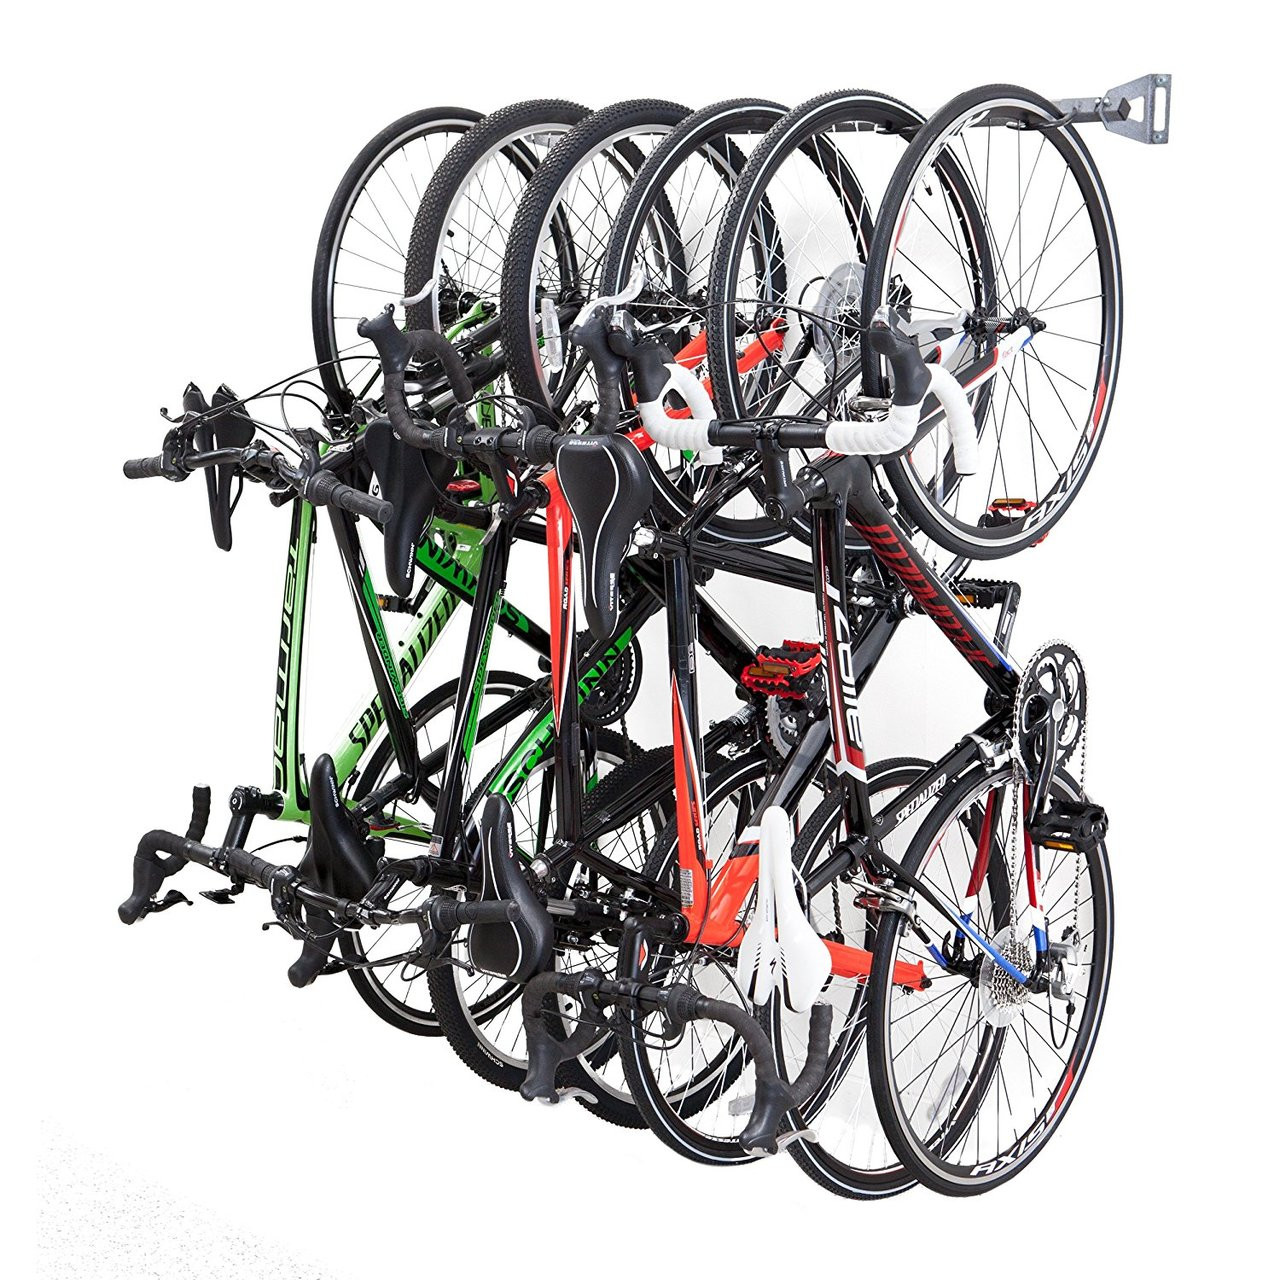 Bike Storage Rack | 6 Hanging Bikes